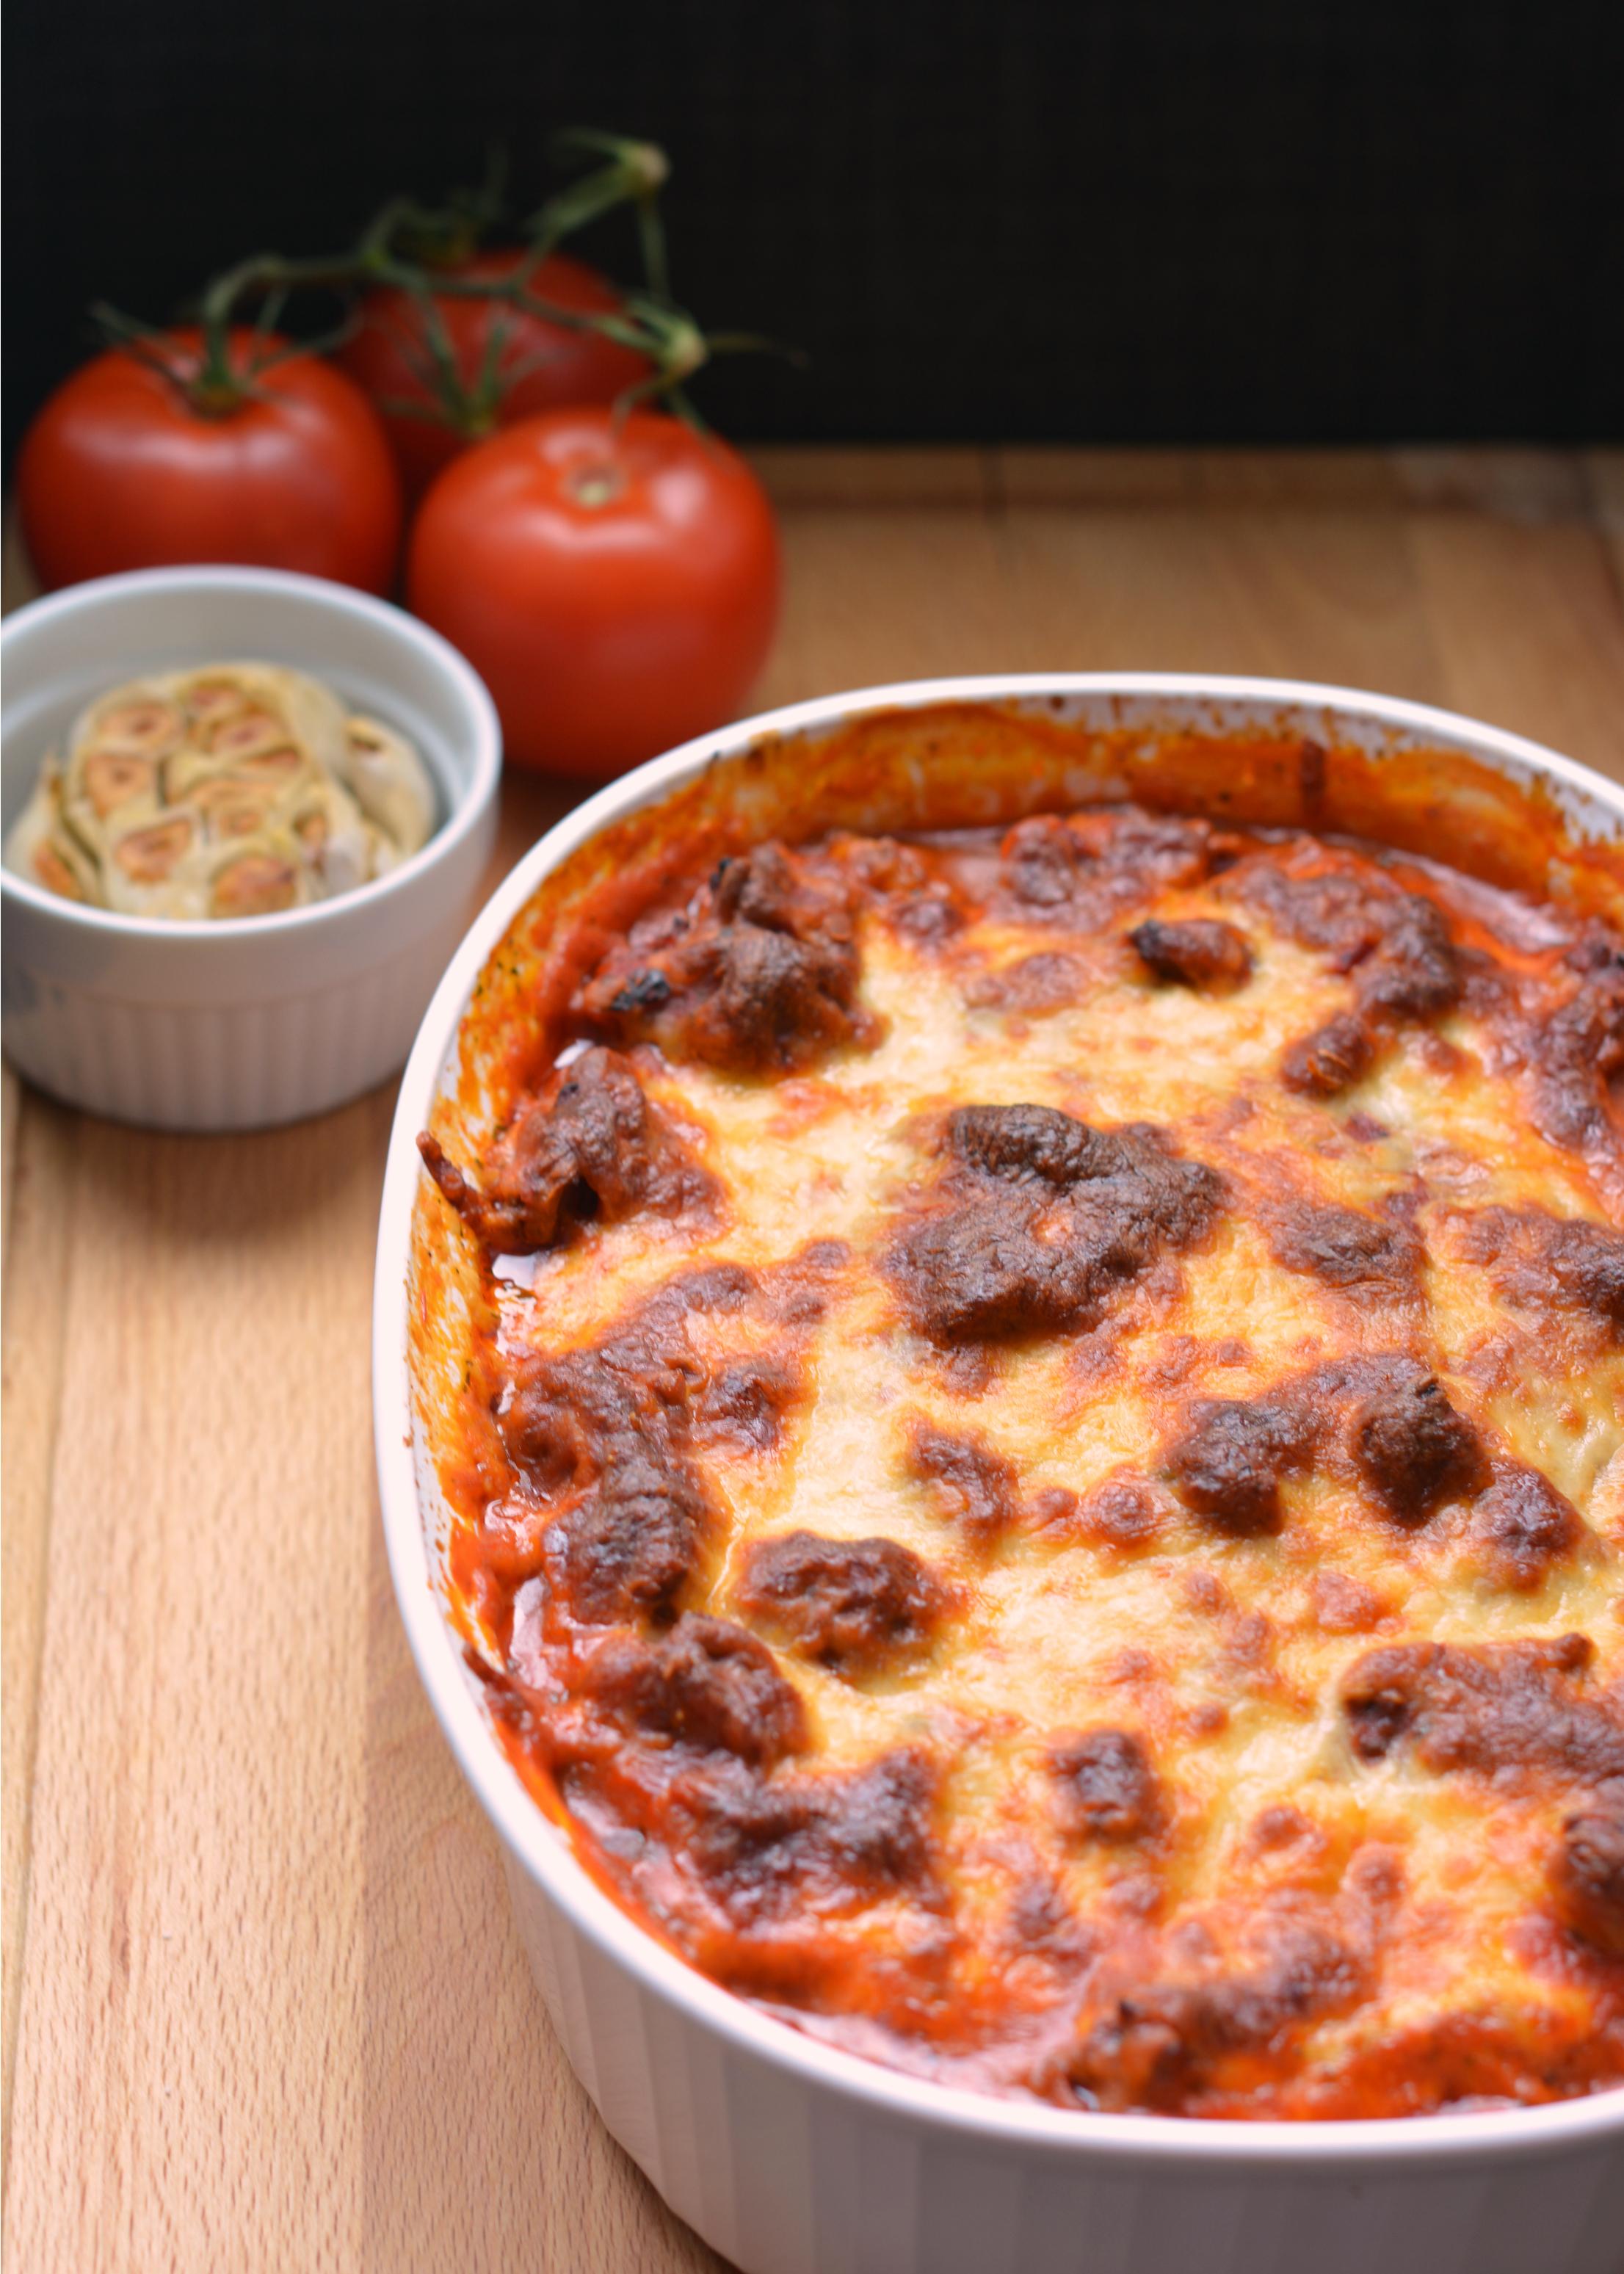 Our Sunday Night Favourite: Roasted Garlic Eggplant Lasagna